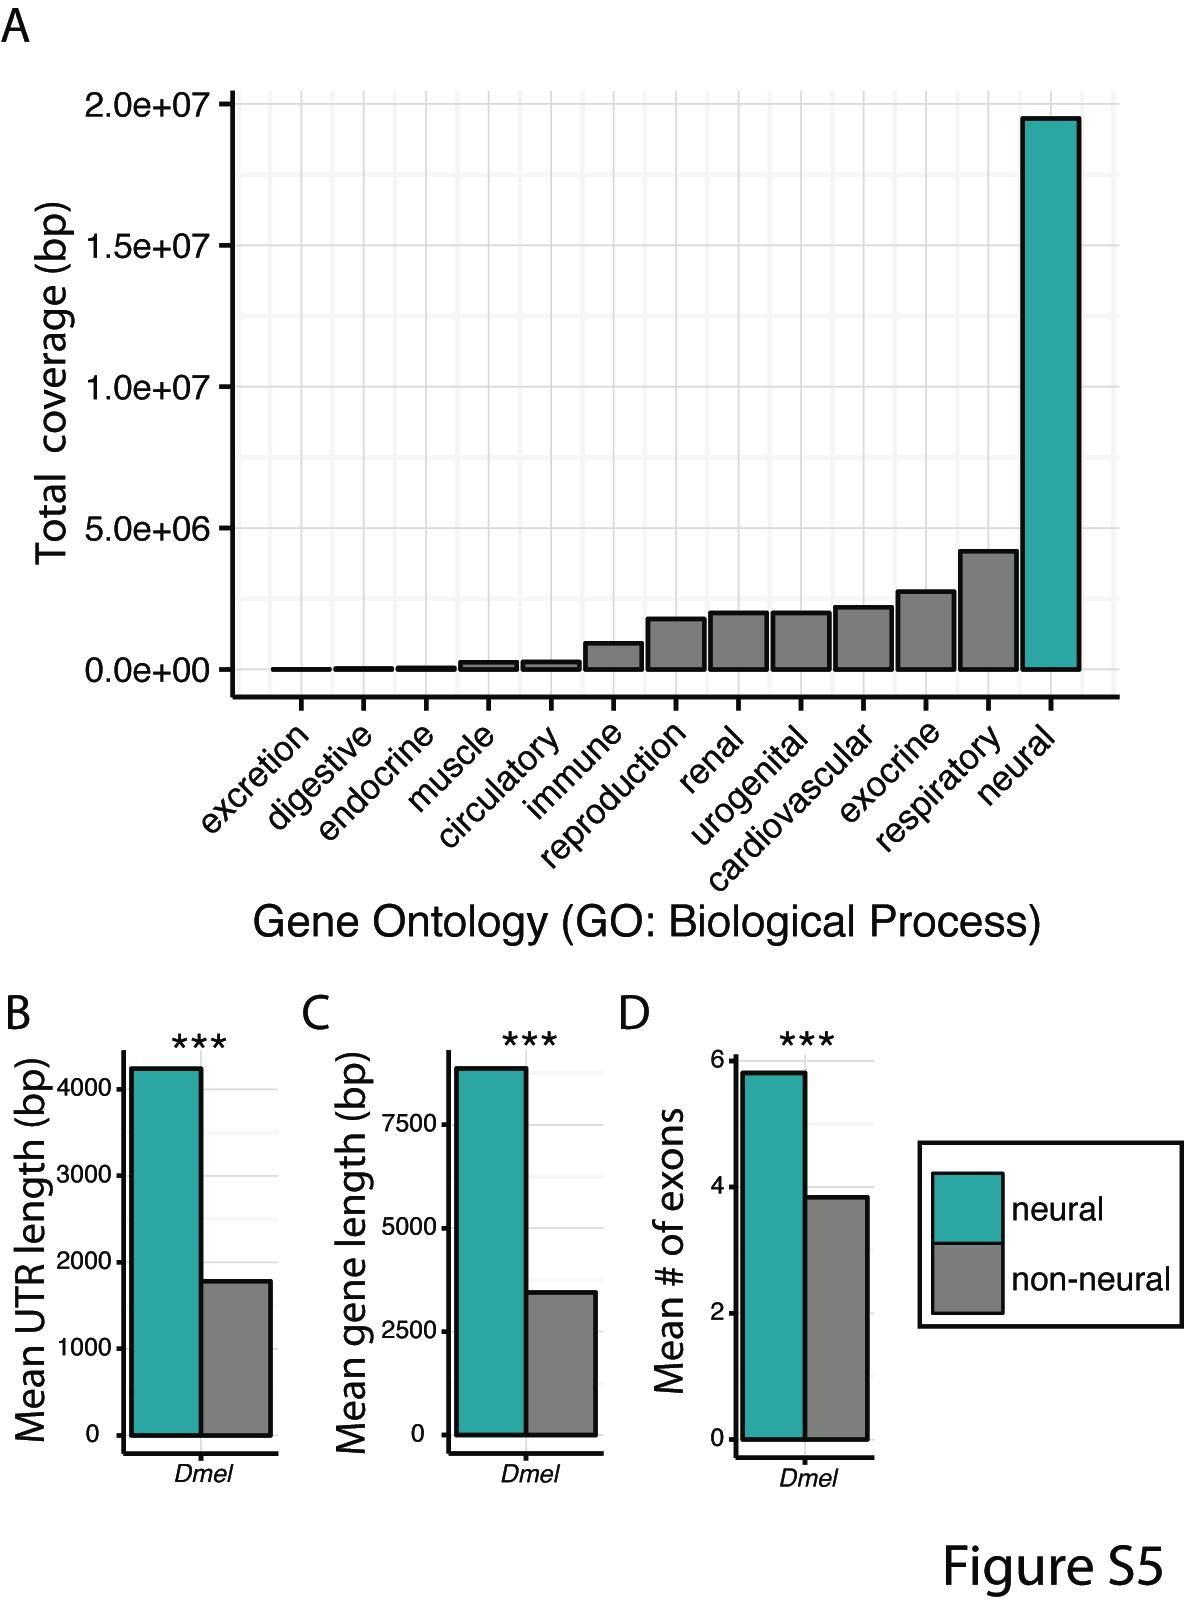 Large mutational target on neurogenetic genes may promote rapid behavioral change